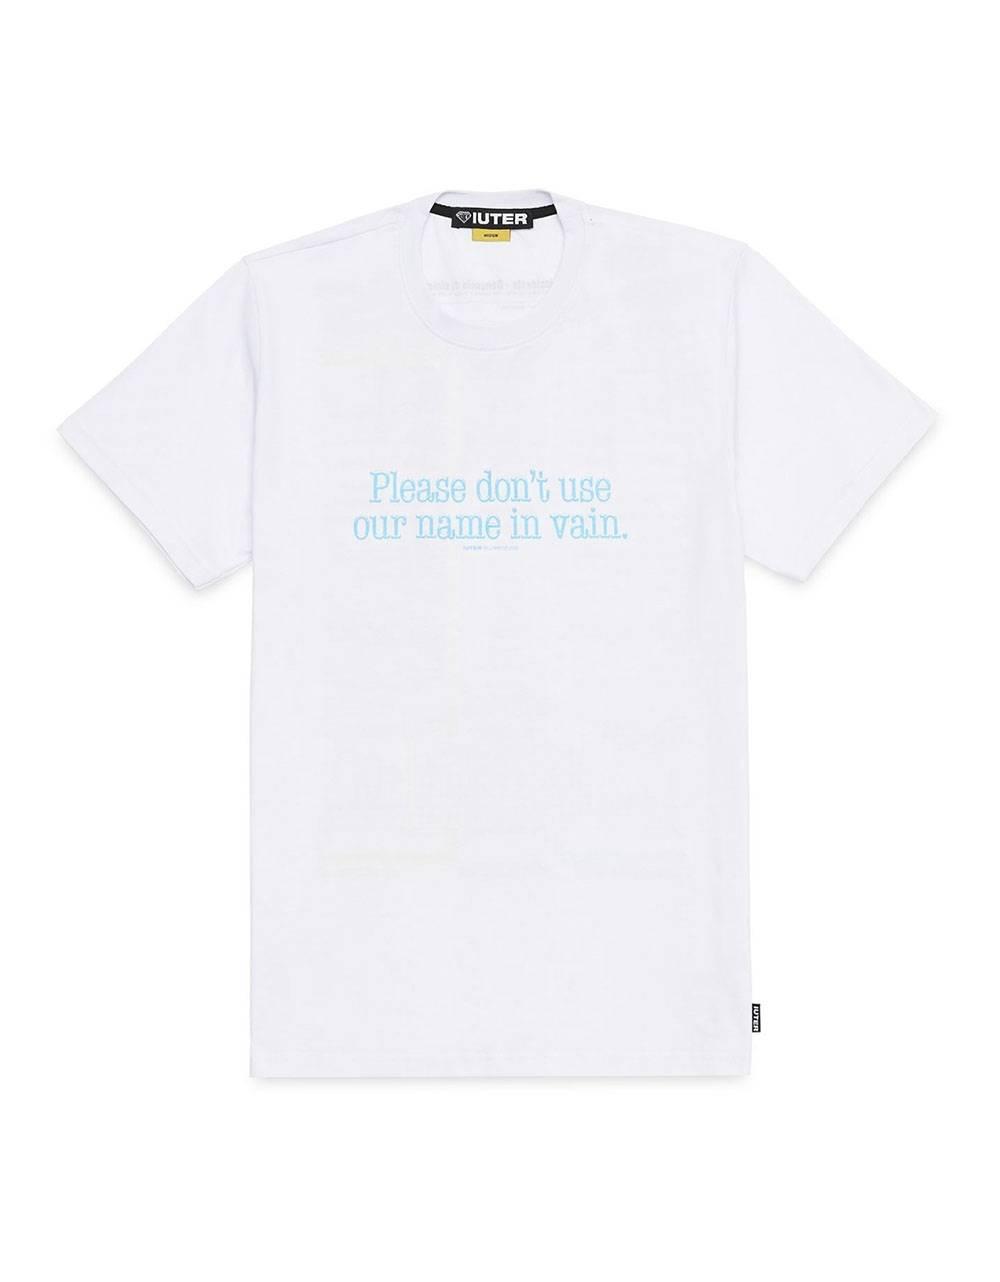 Iuter troubles tee - White IUTER T-shirt 45,00€